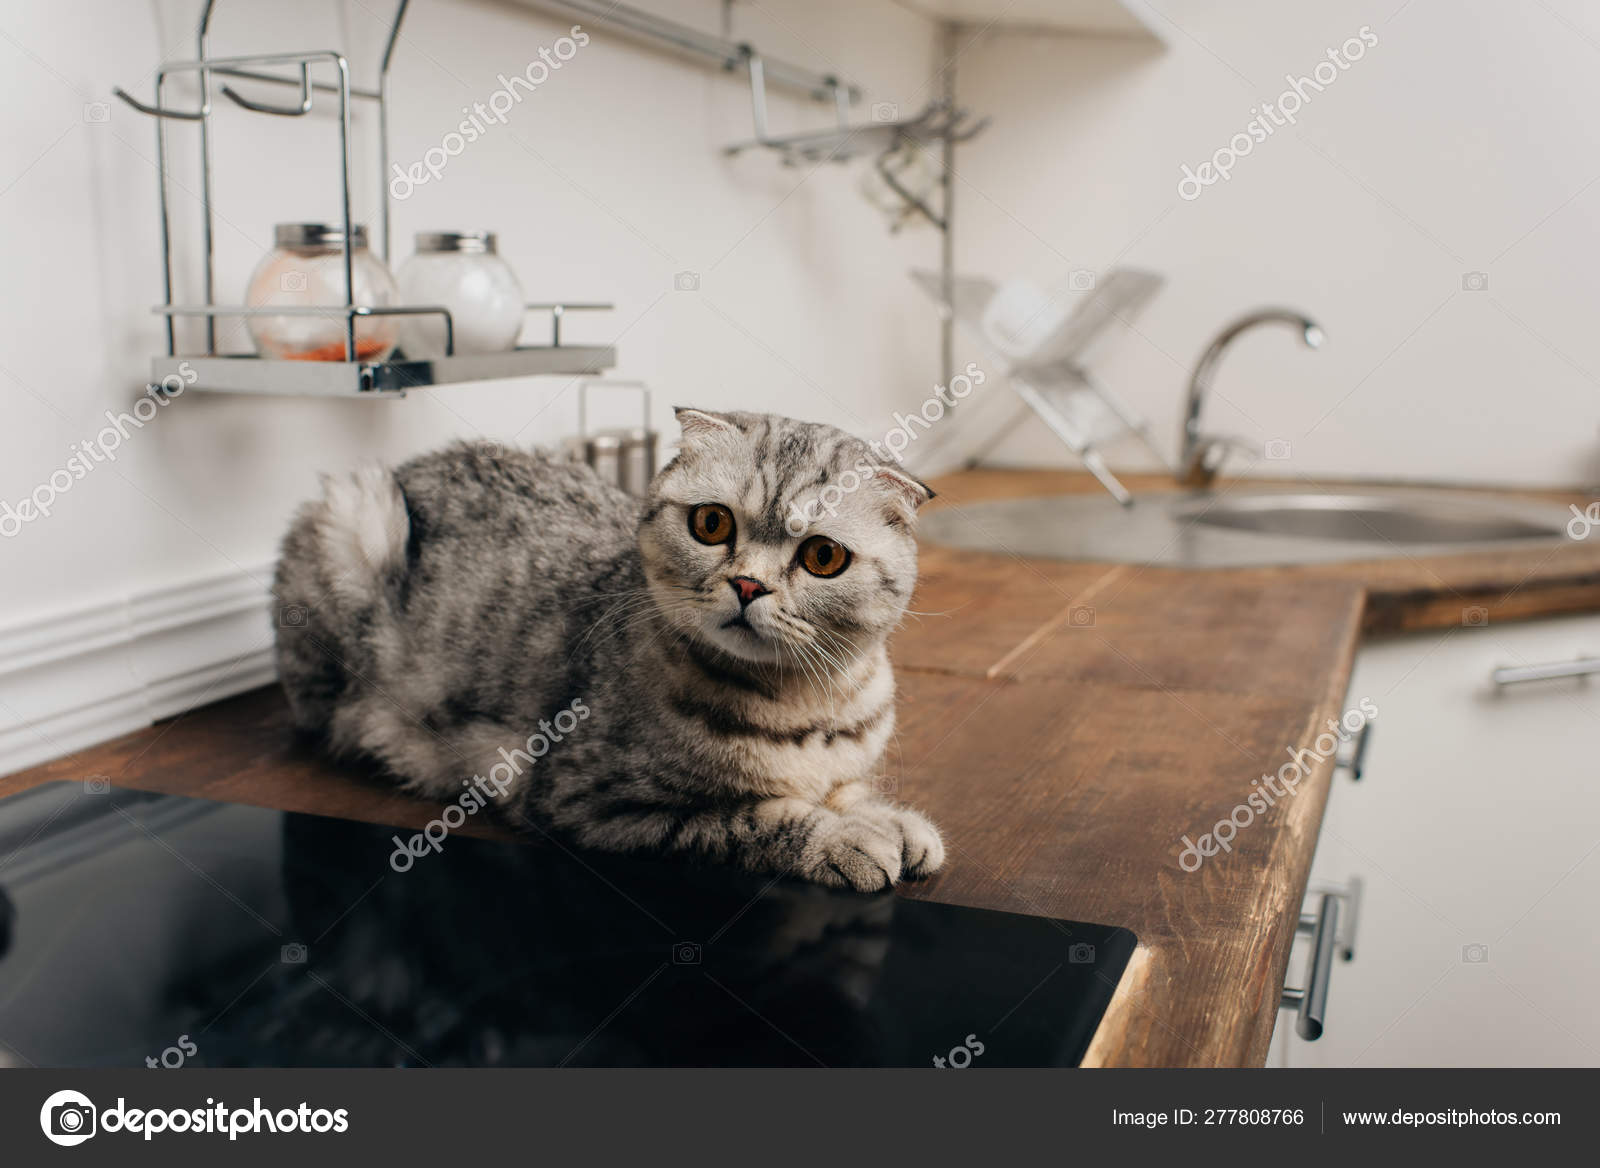 Cute Grey Scottish Fold Cat Sitting Kitchen Counter Stock Photo Image By C Haydmitriy 277808766